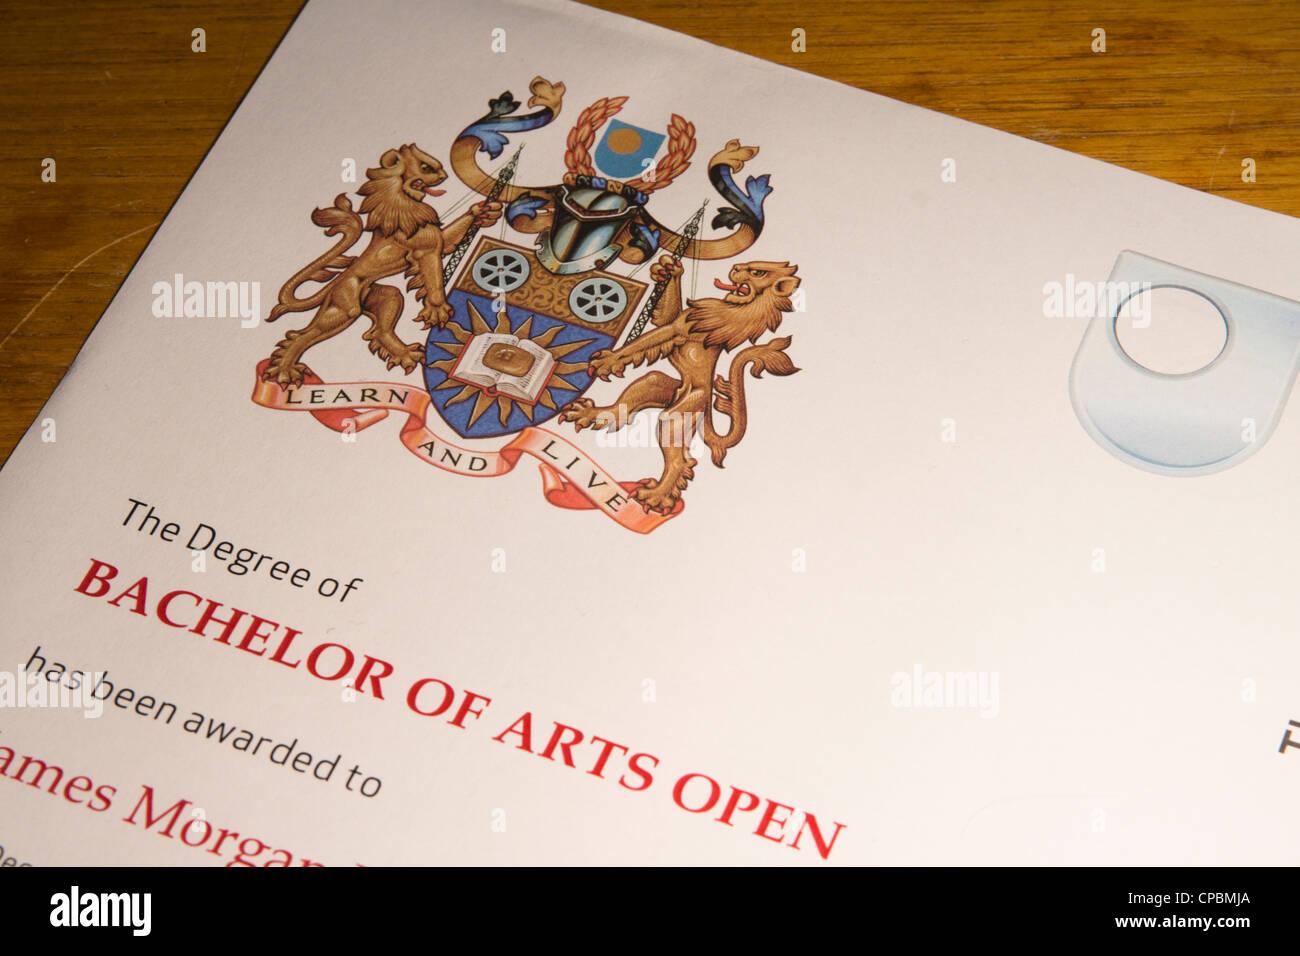 Open University Degree Certificate - Stock Image